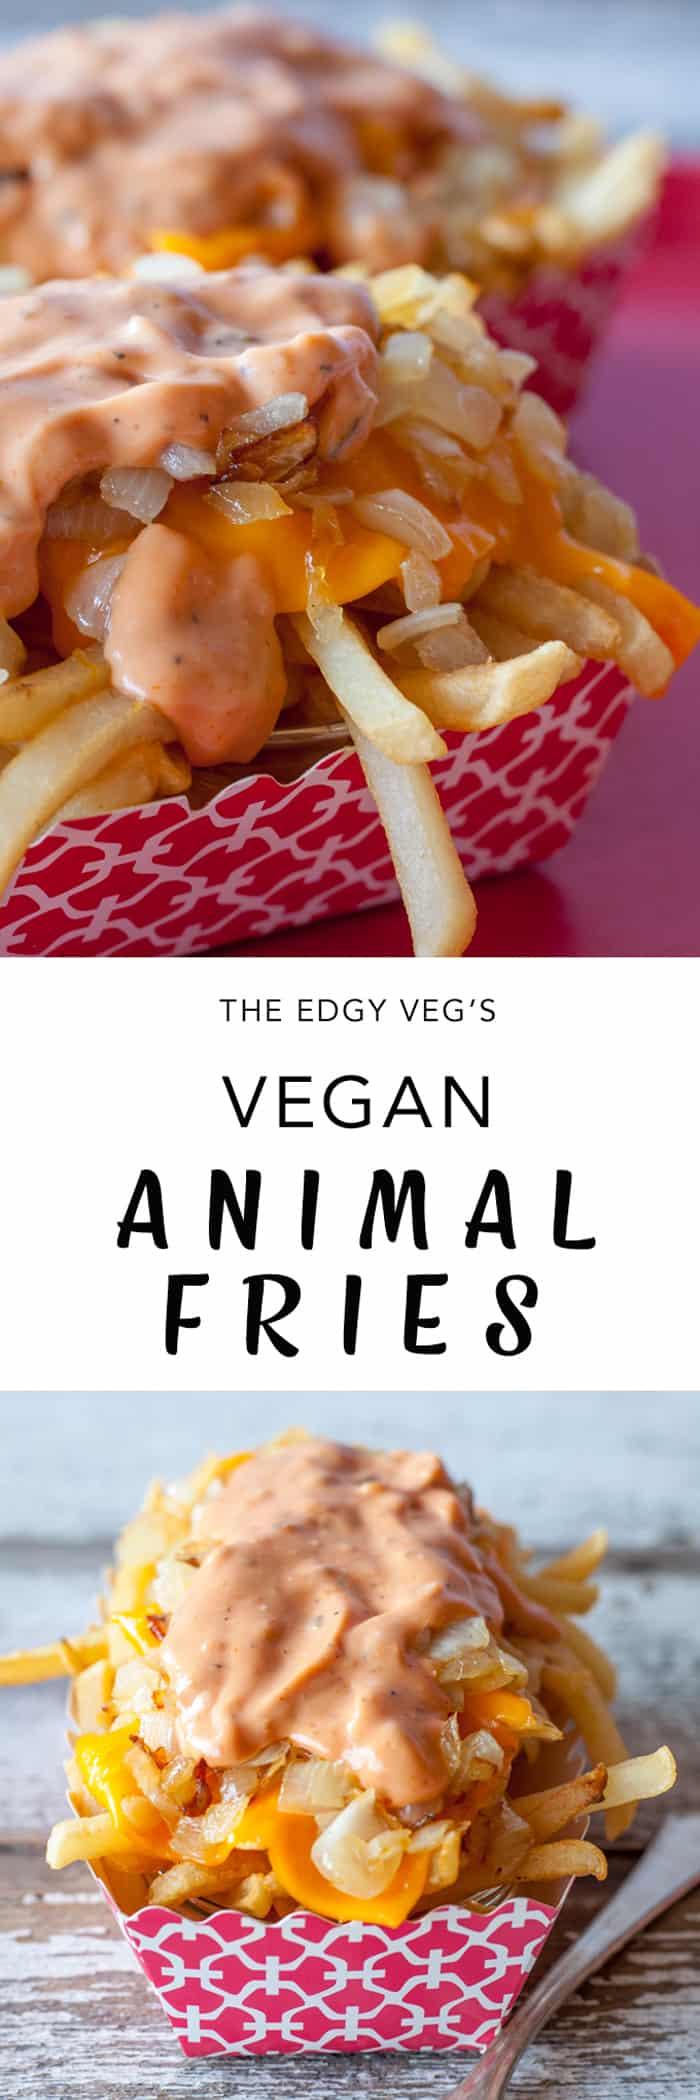 Vegan animal style fries recipe